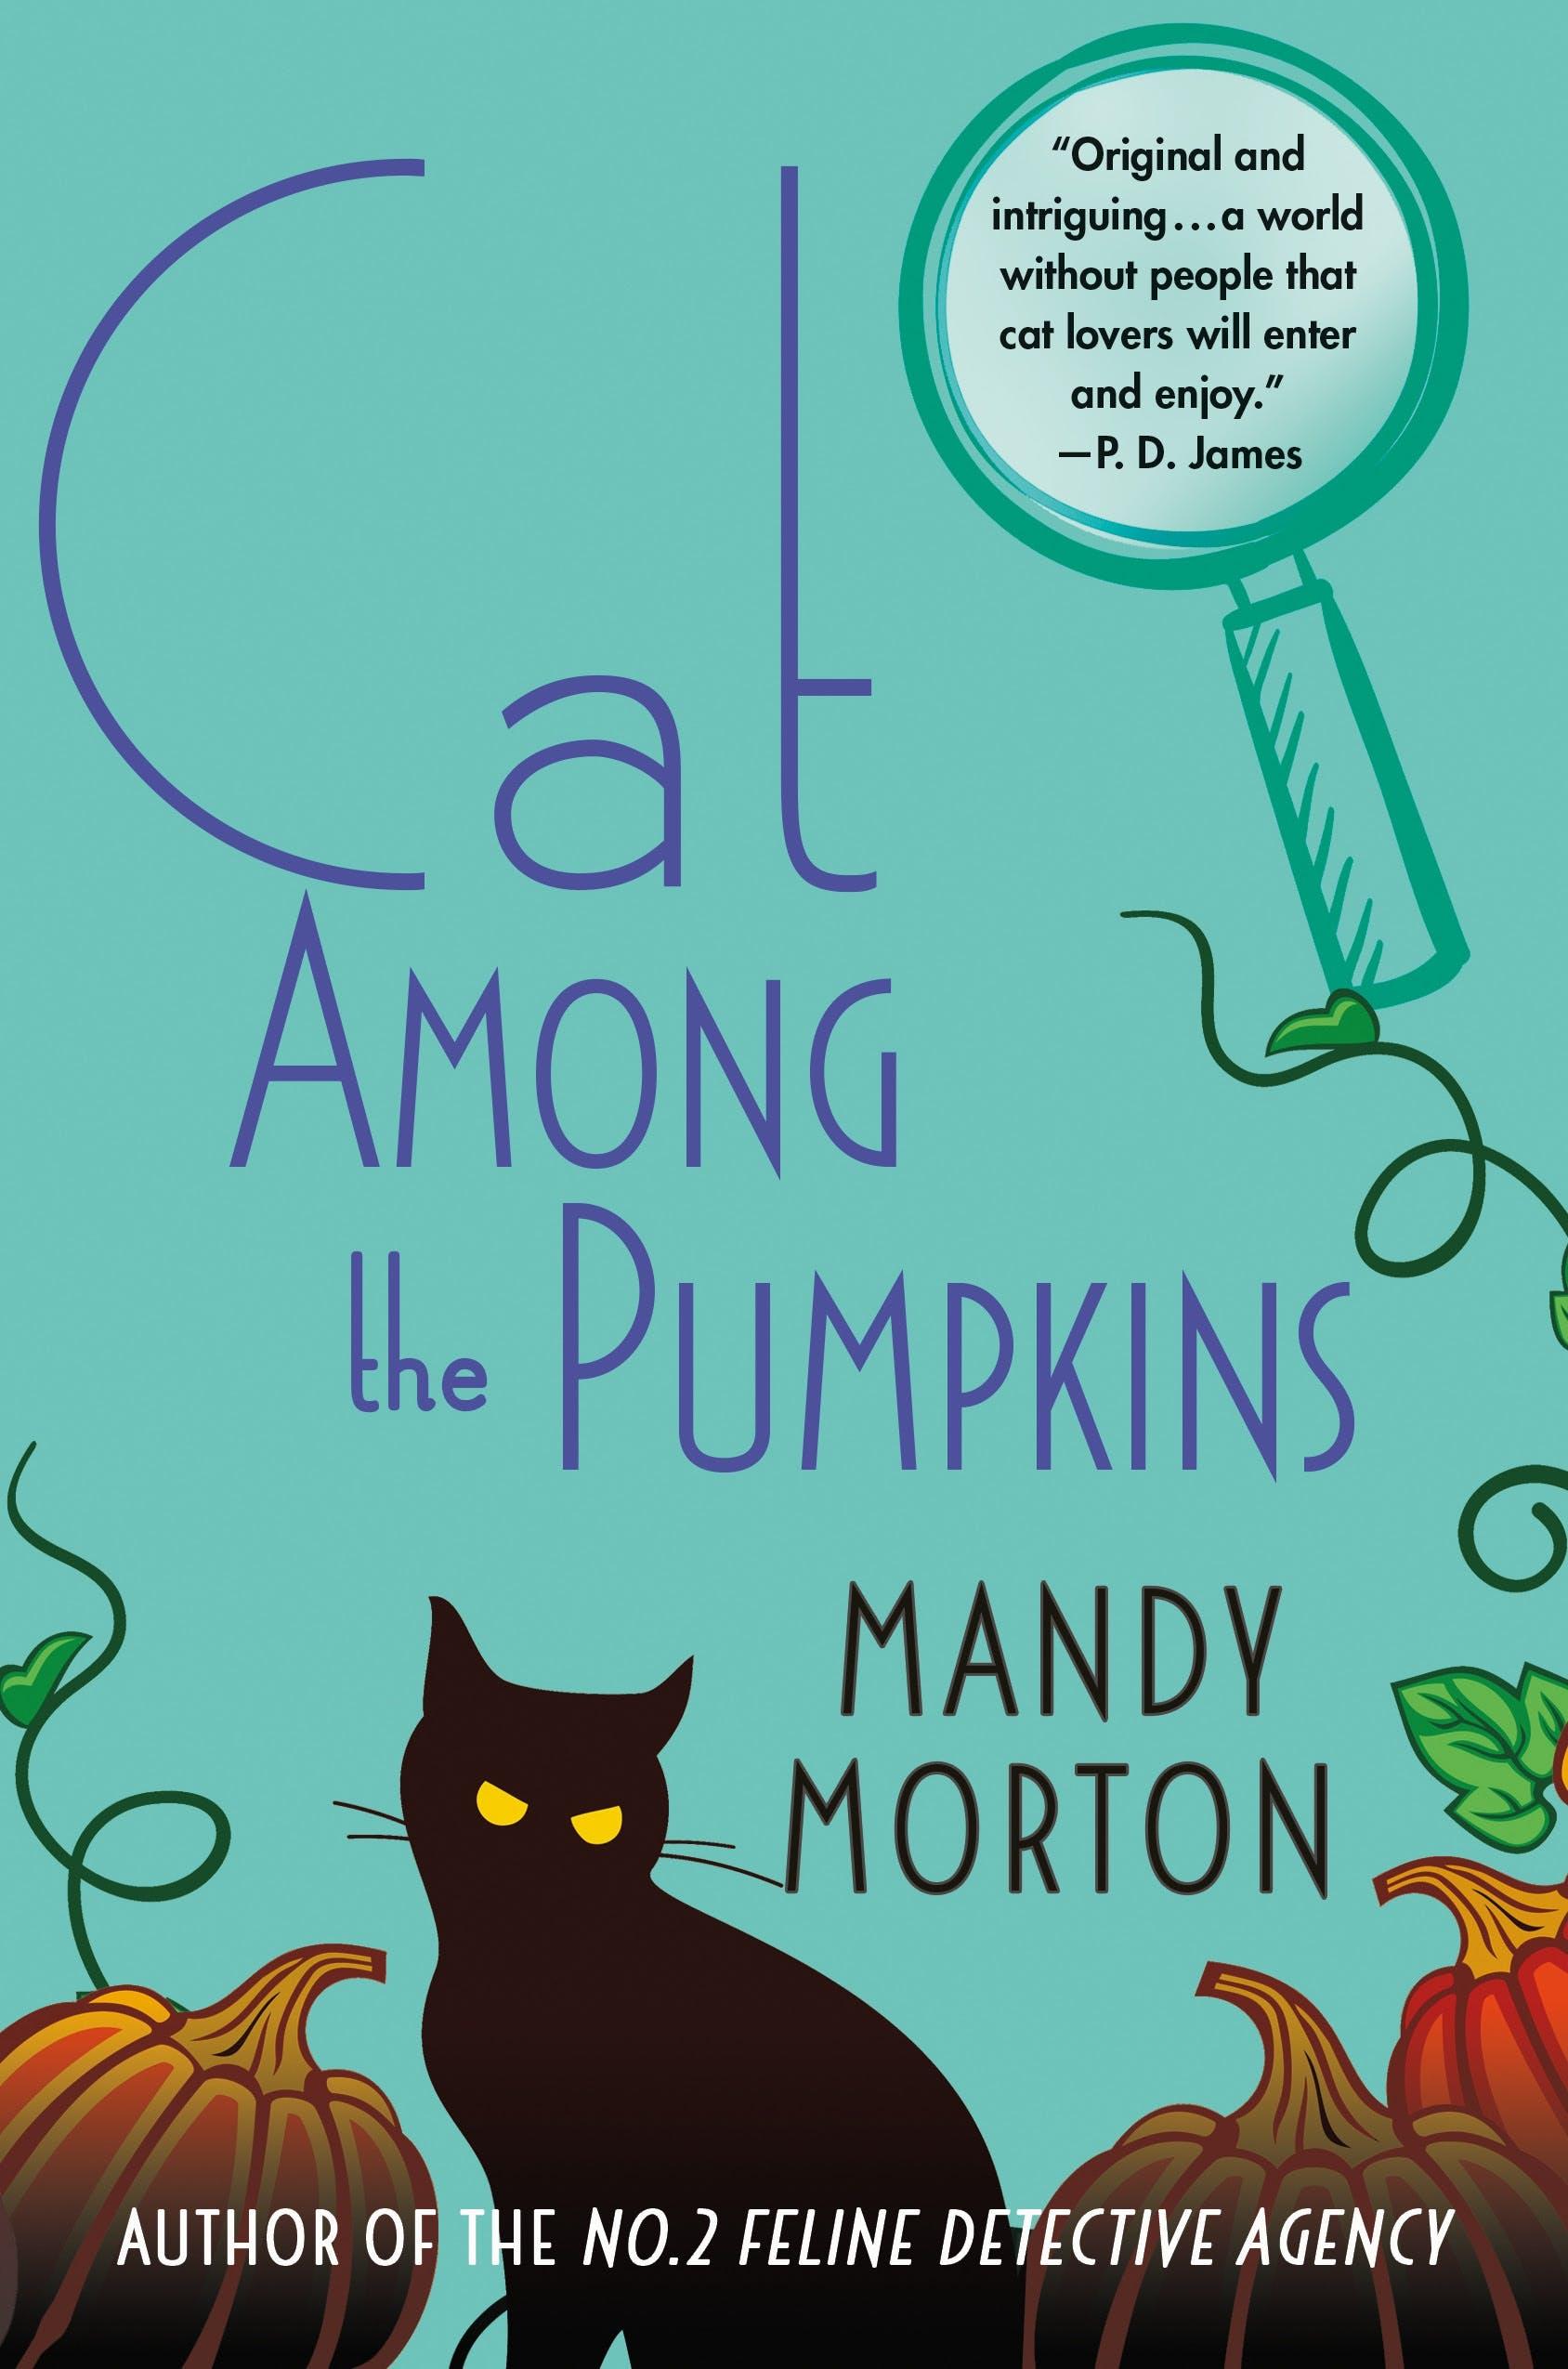 Image of Cat Among the Pumpkins